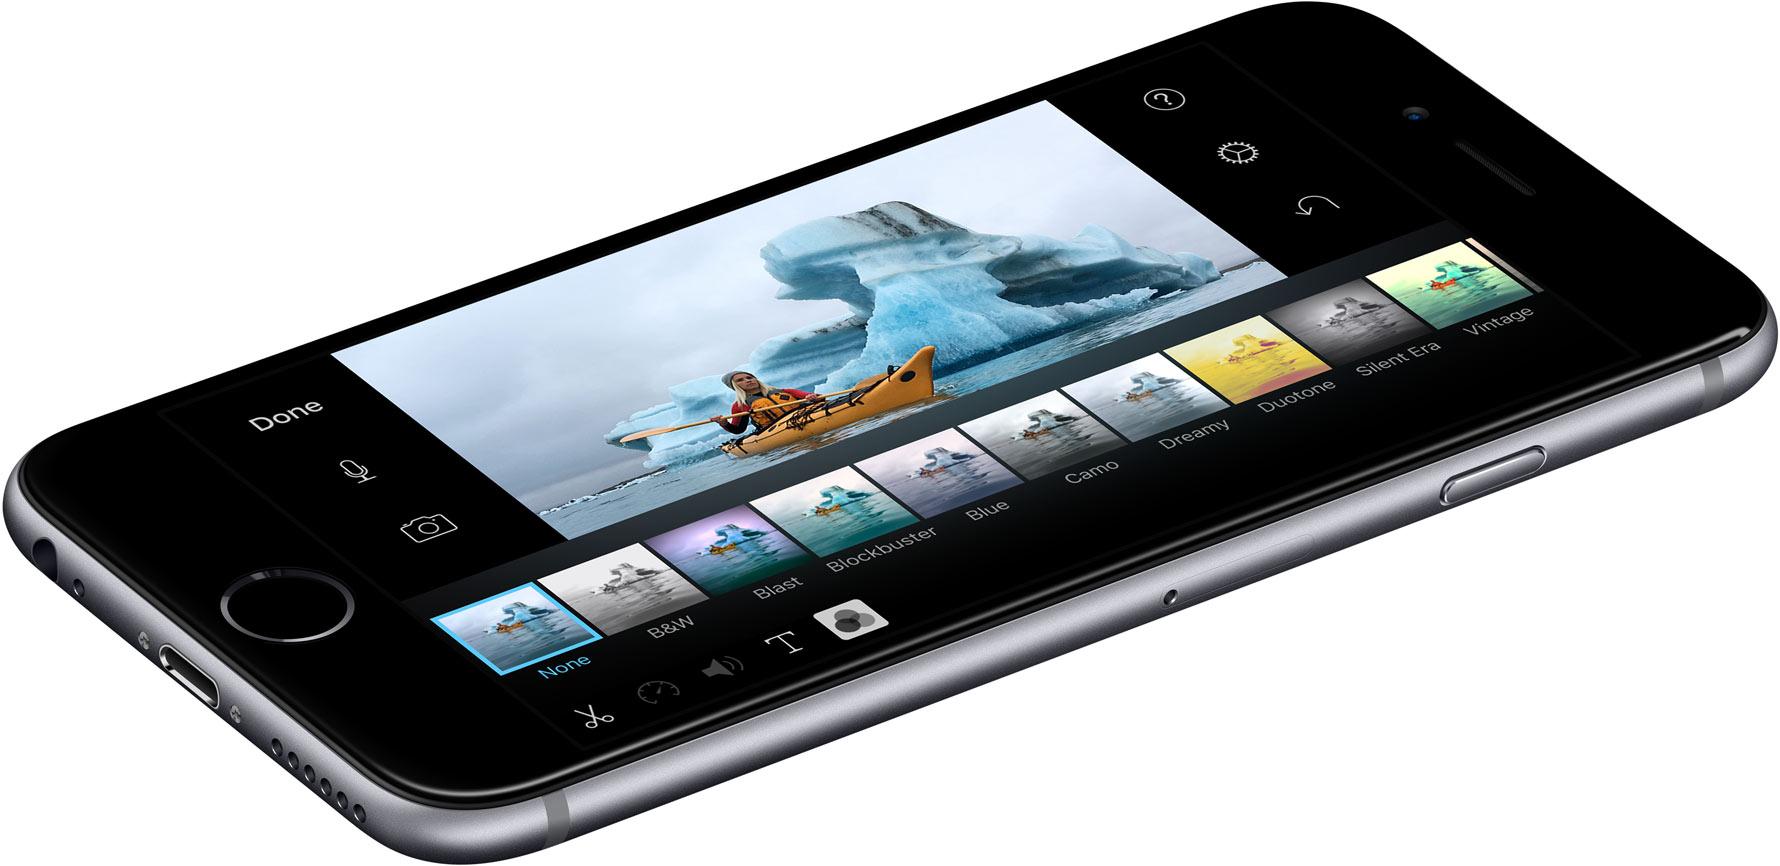 imovie-for-iPhone